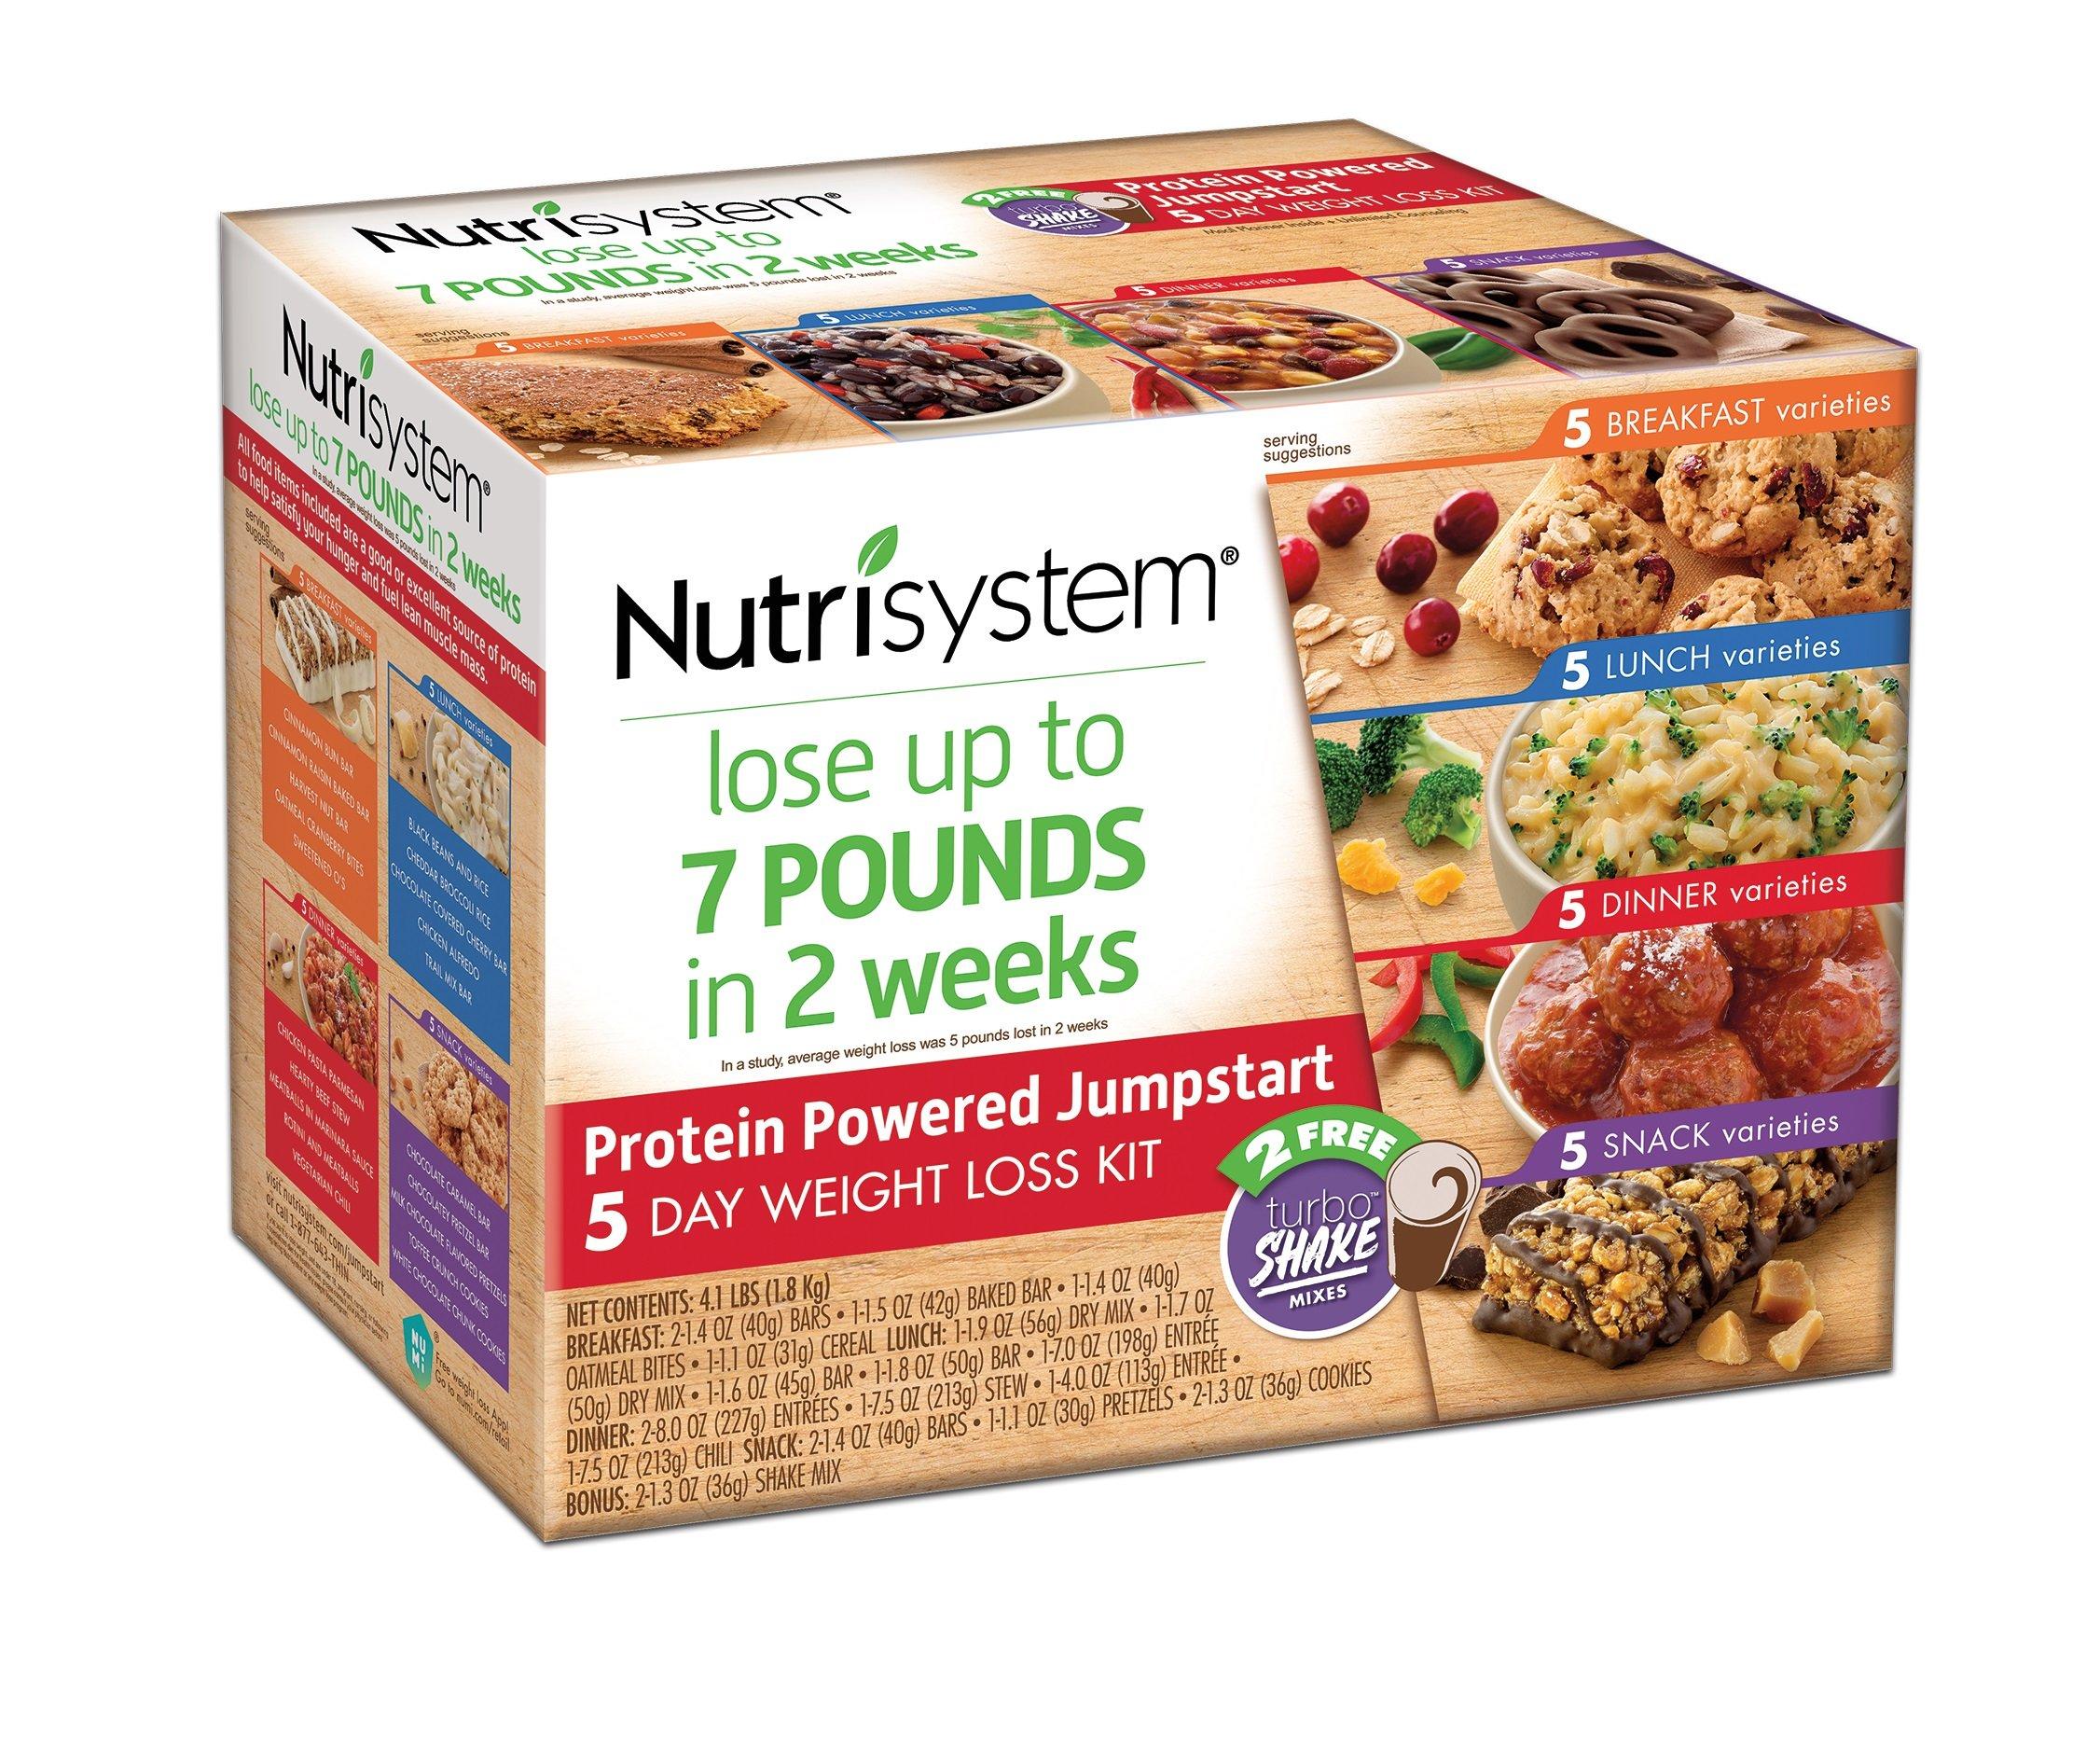 Nutrisystem® Protein Powered Jumpstart 5 Day Weight Loss Kit